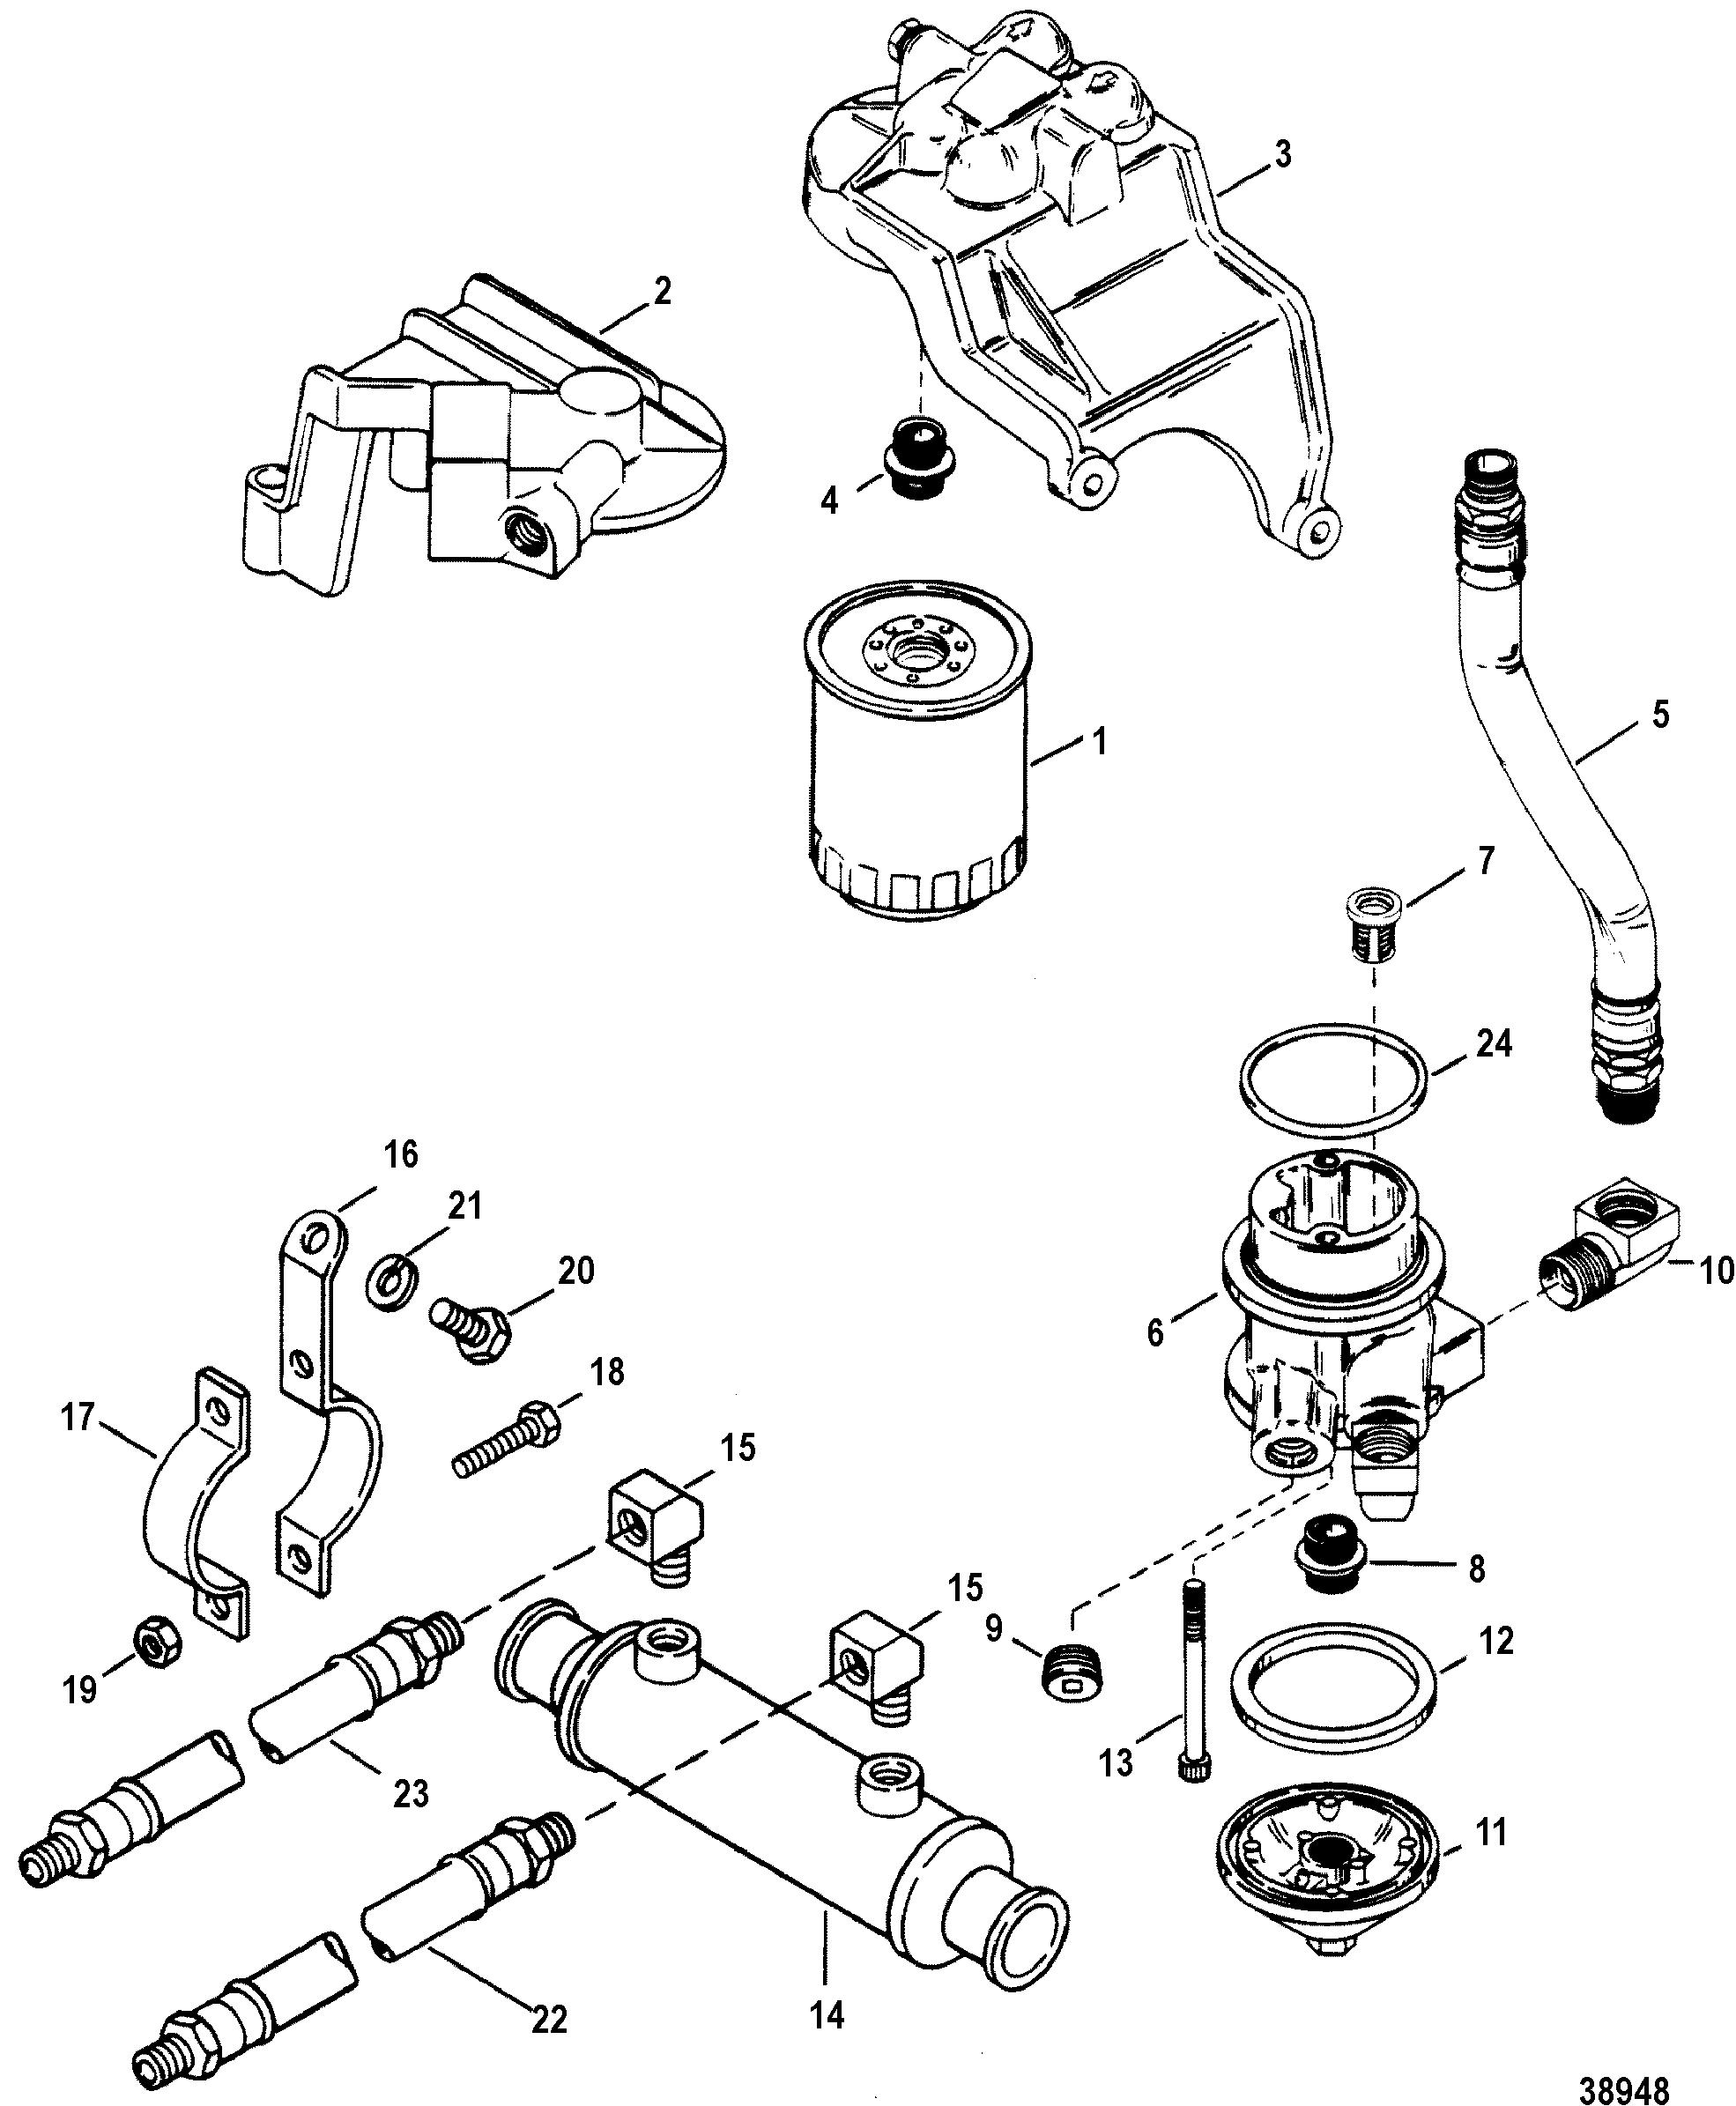 Mercruiser 340 Mie W B W Gm